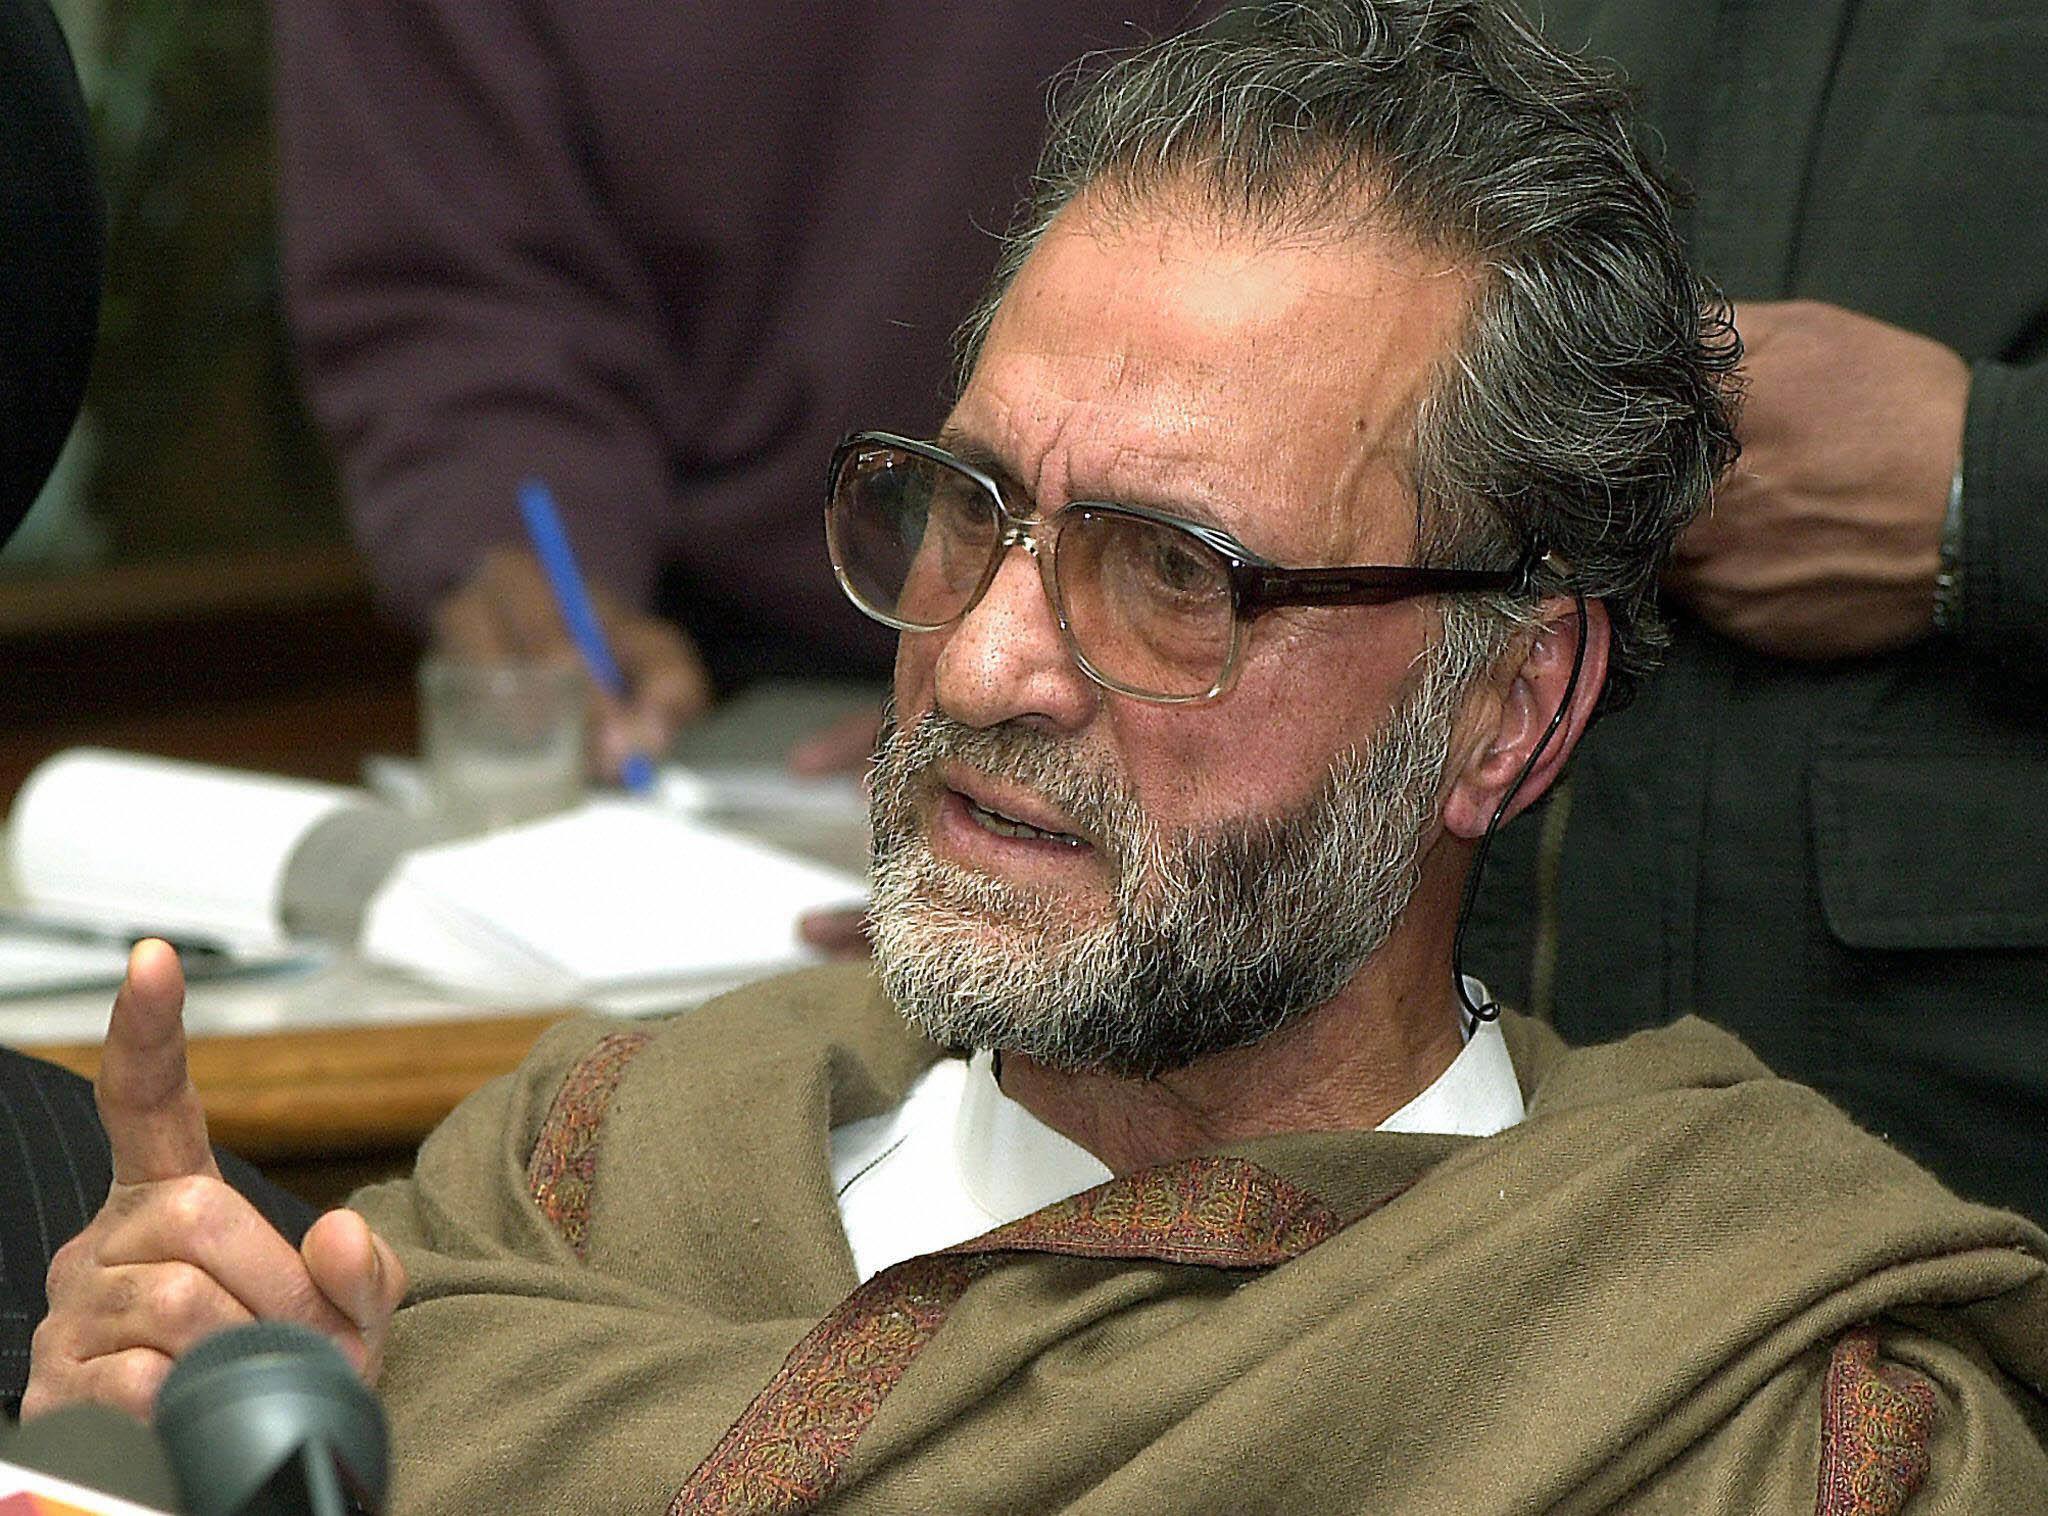 Abdul Ghani Lone was assassinated by unidentified gunmen in Srinagar in 2002. Photo credit: AFP